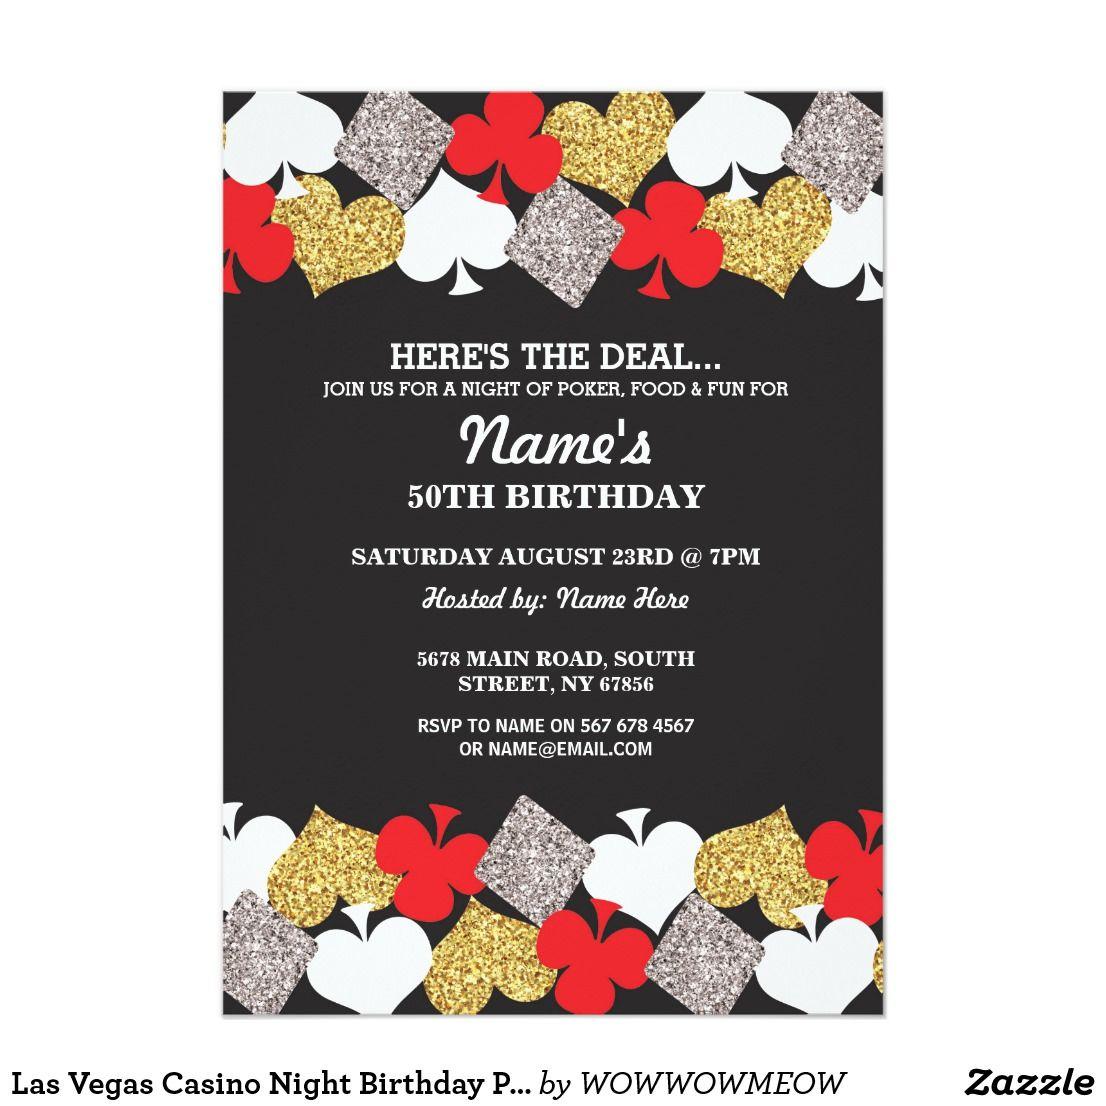 Casino Wedding Invitations: Las Vegas Casino Night Birthday Party Invitation